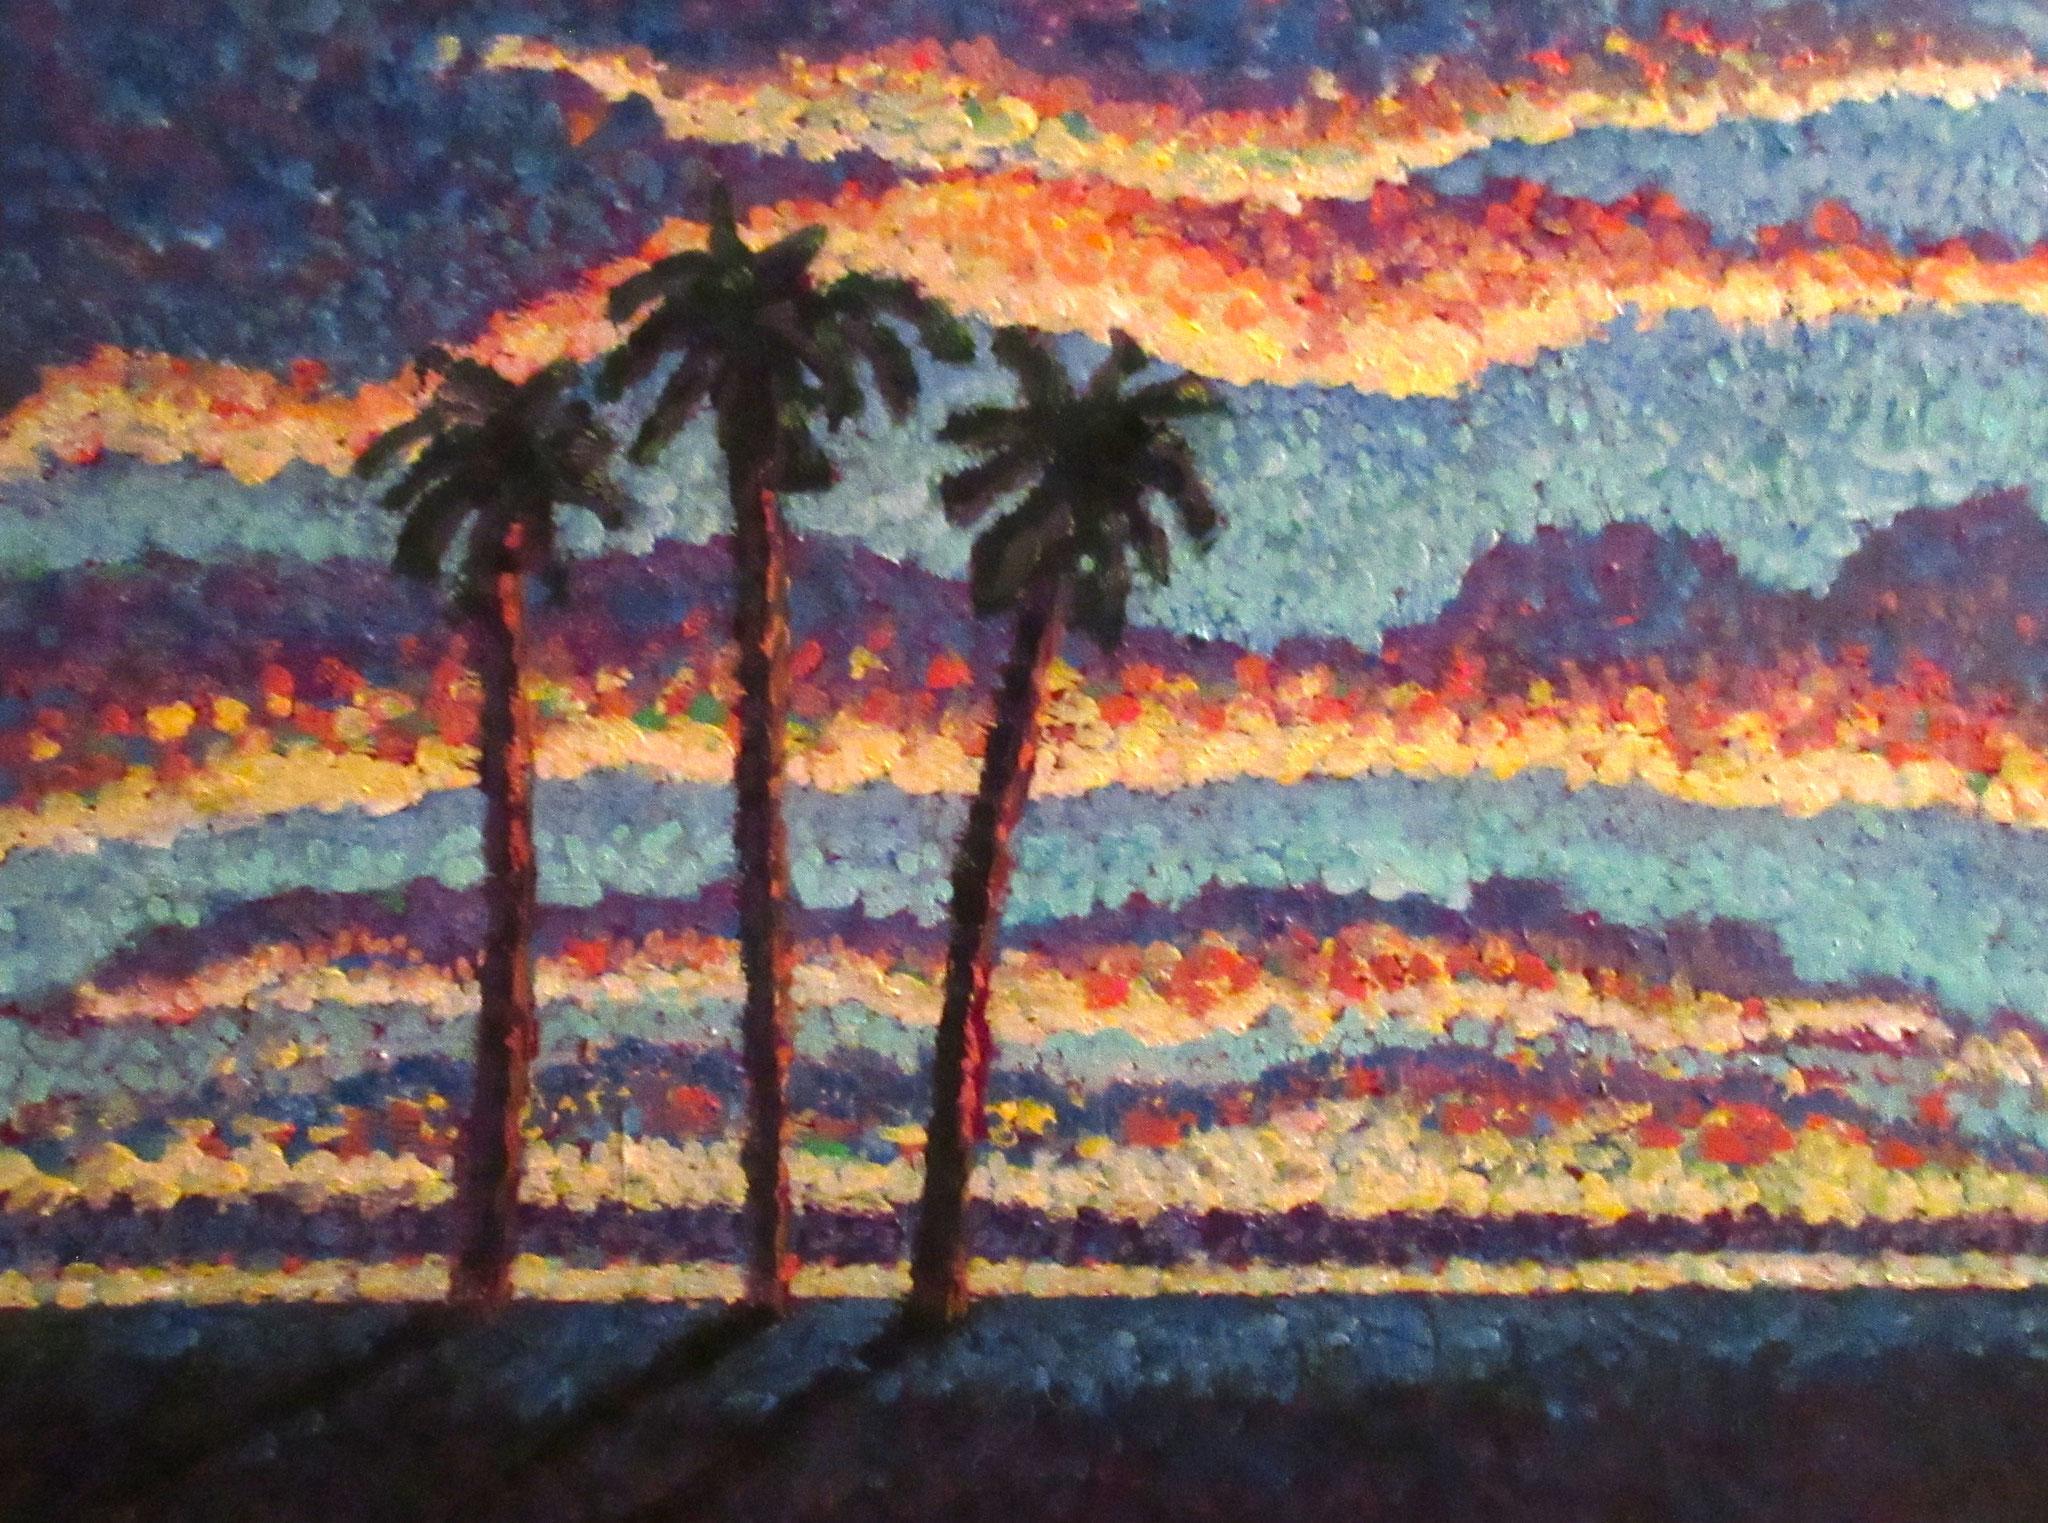 Sunset, oil on canvas 12x16, November 2016 - (1)